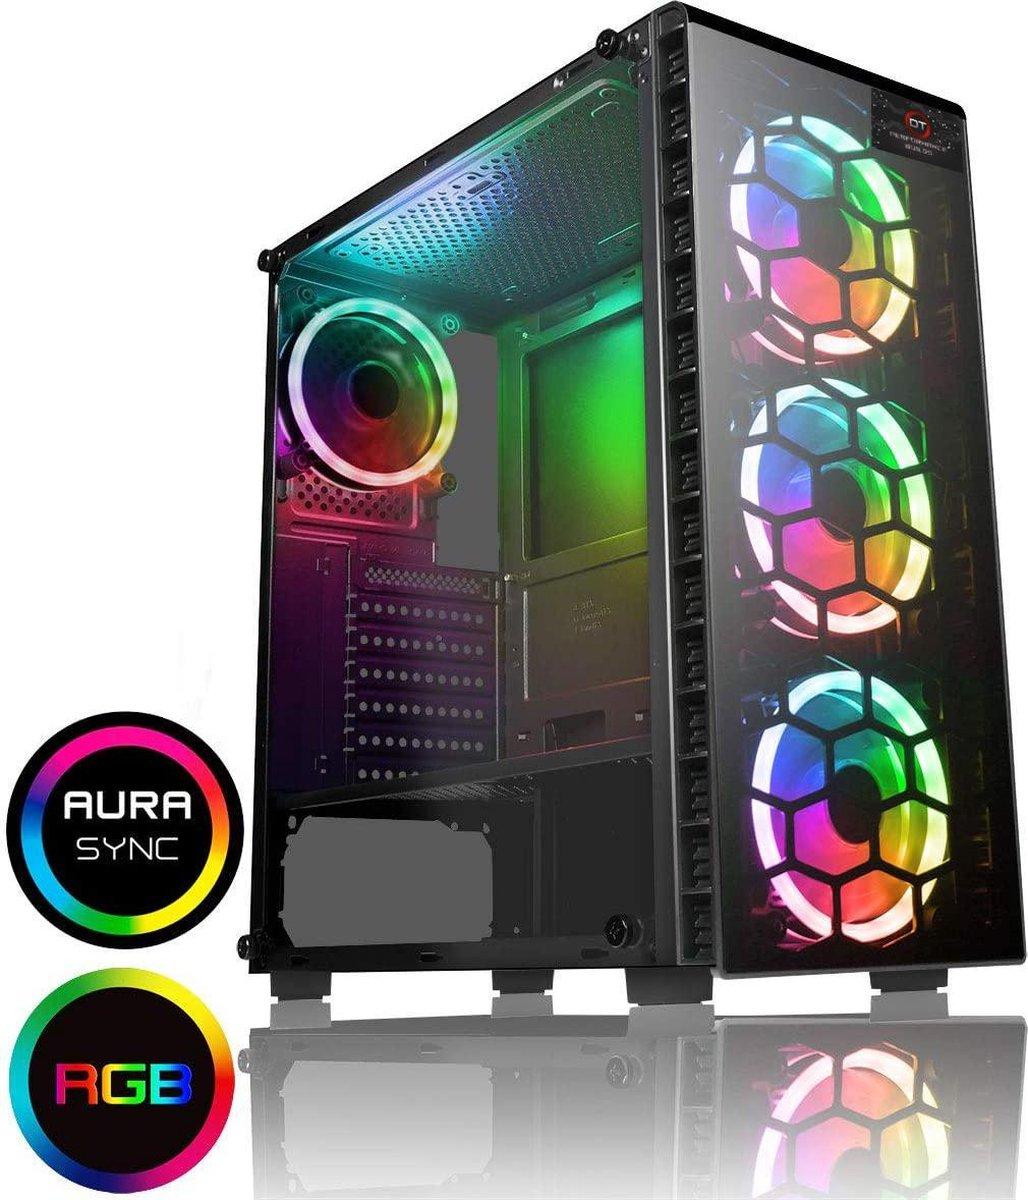 High-End Game PC – Ryzen 7 3700X 4,4Ghz, RTX 3060, 16GB , 250GB NVME SSD + 1TB HDD met RGB verlichting en WIFI